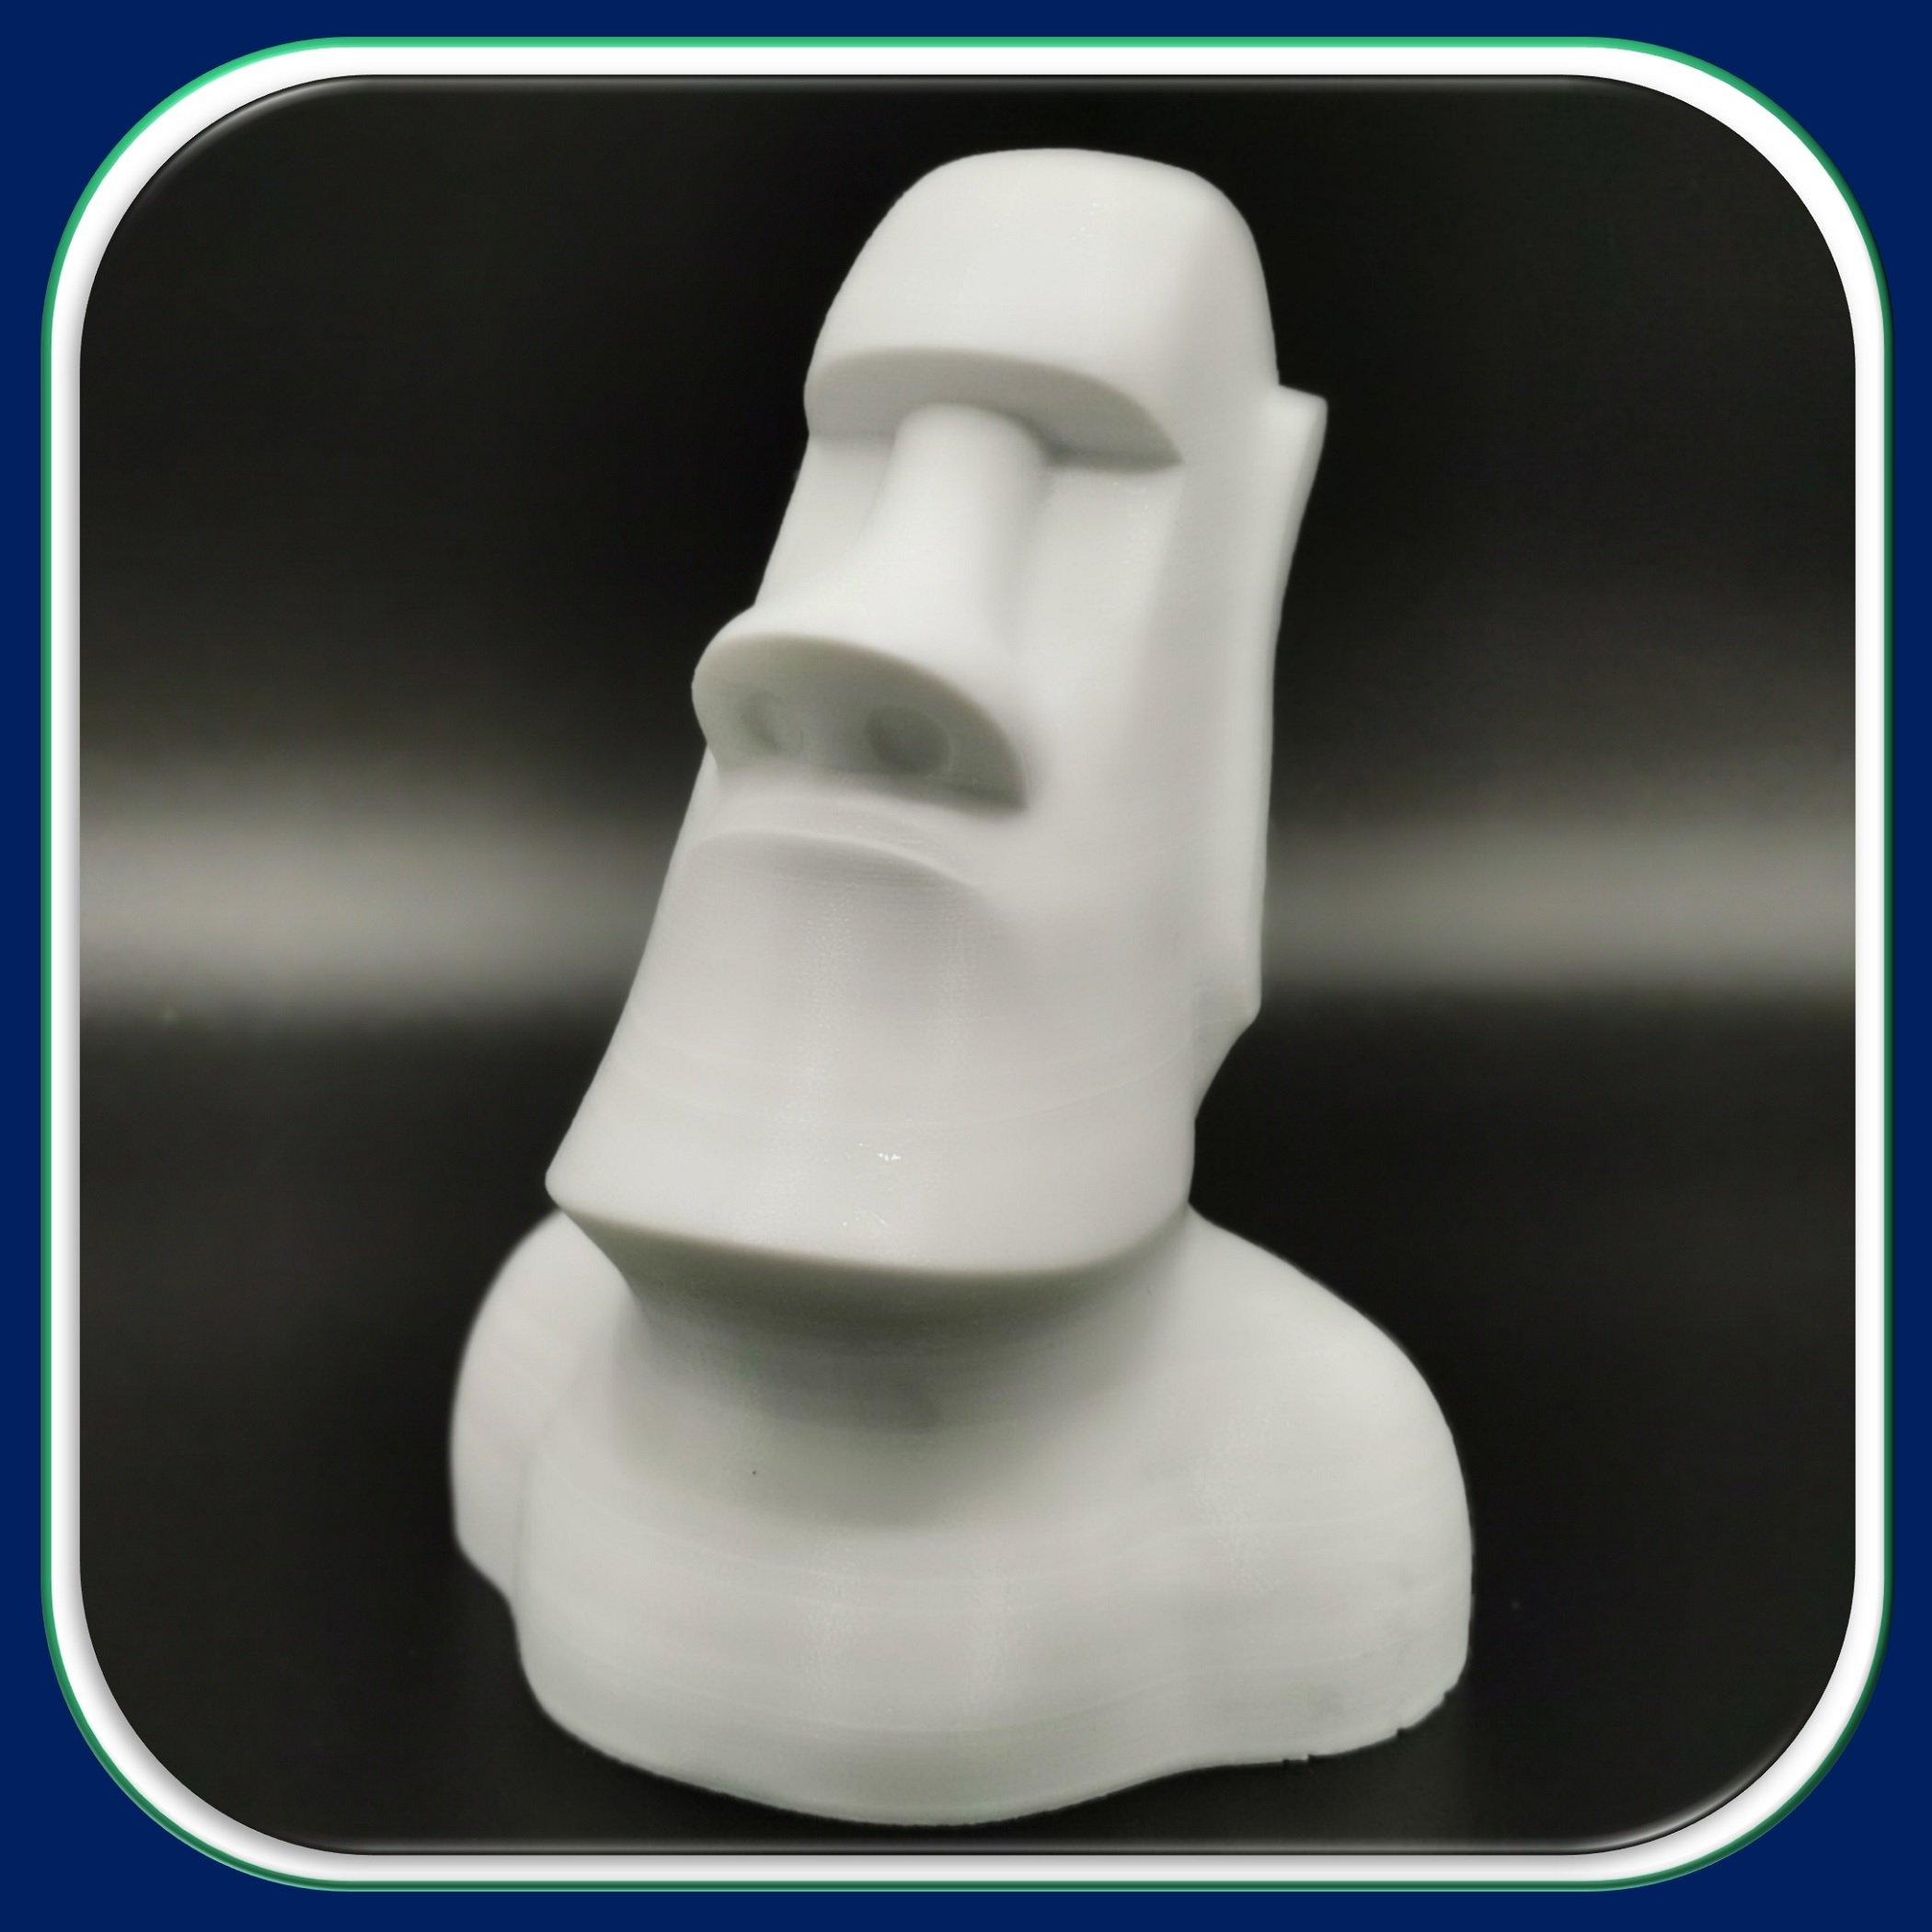 Solutions Efikeco - Moai 1